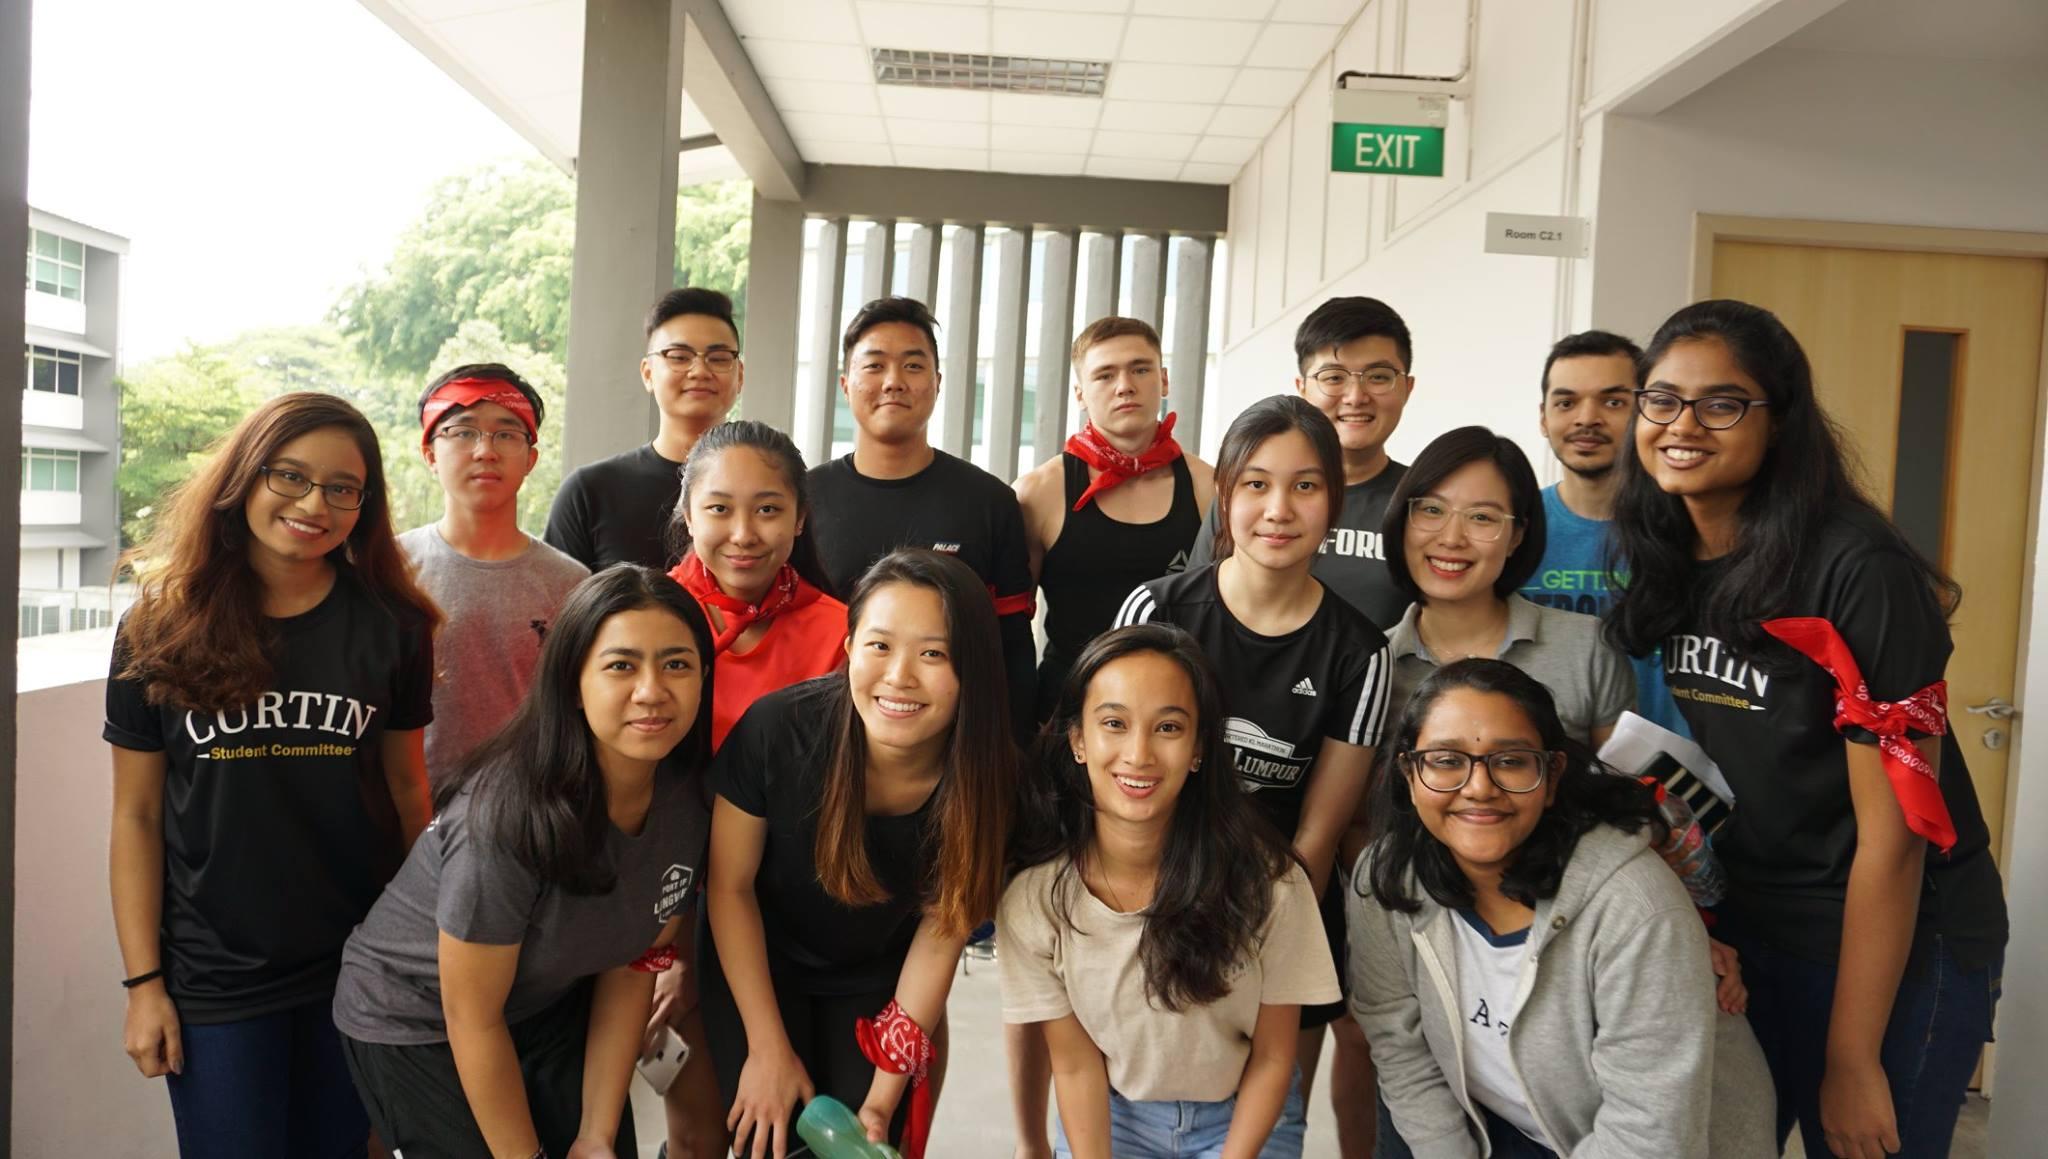 du học singapore tại đại học curtin